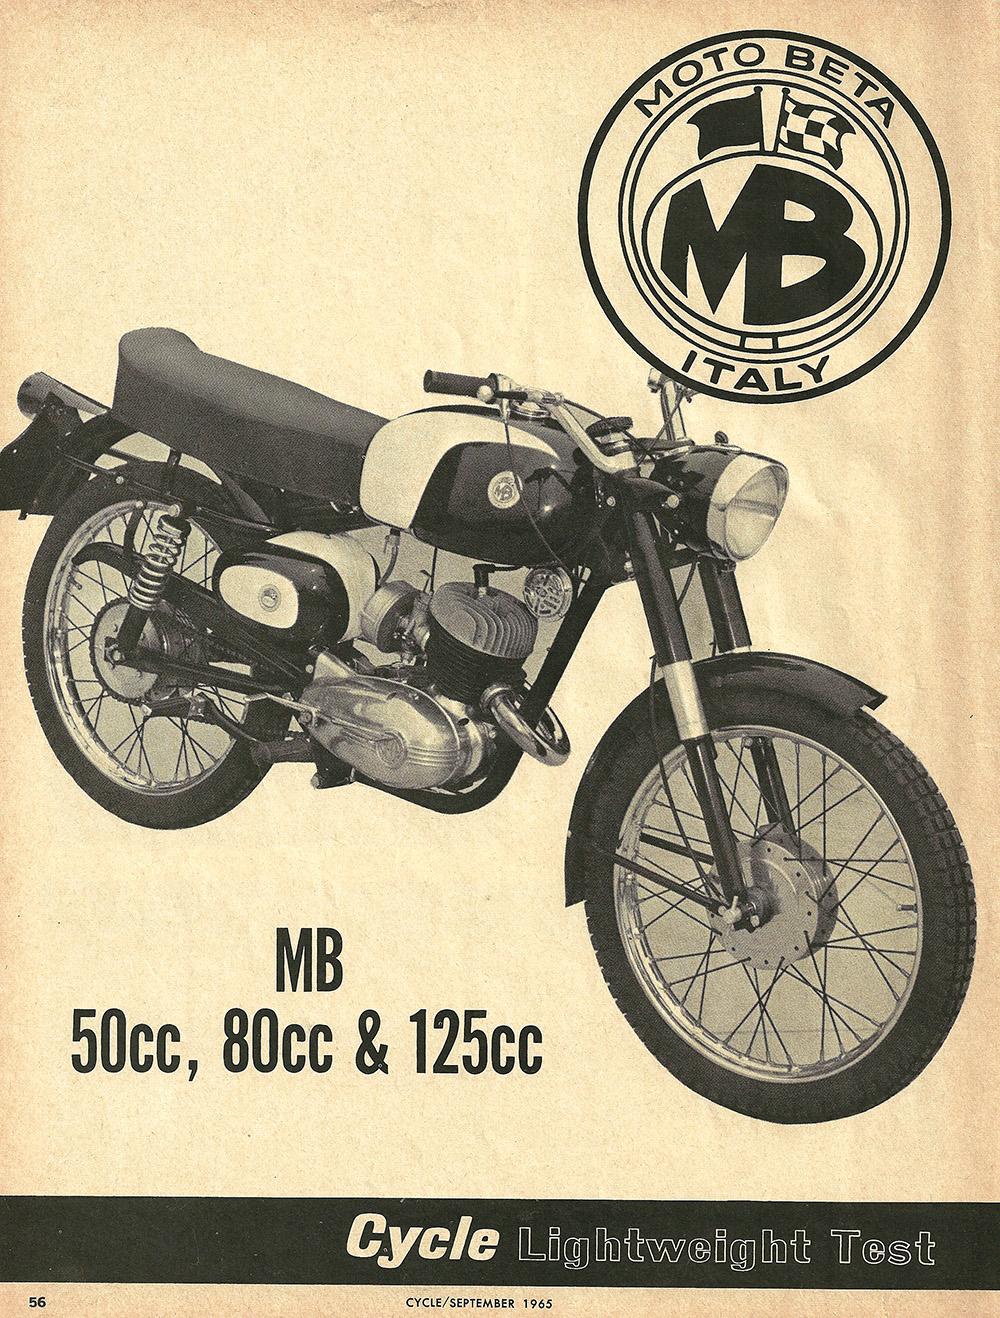 1966 Moto Beta 50cc 80cc 125cc road test 1.JPG